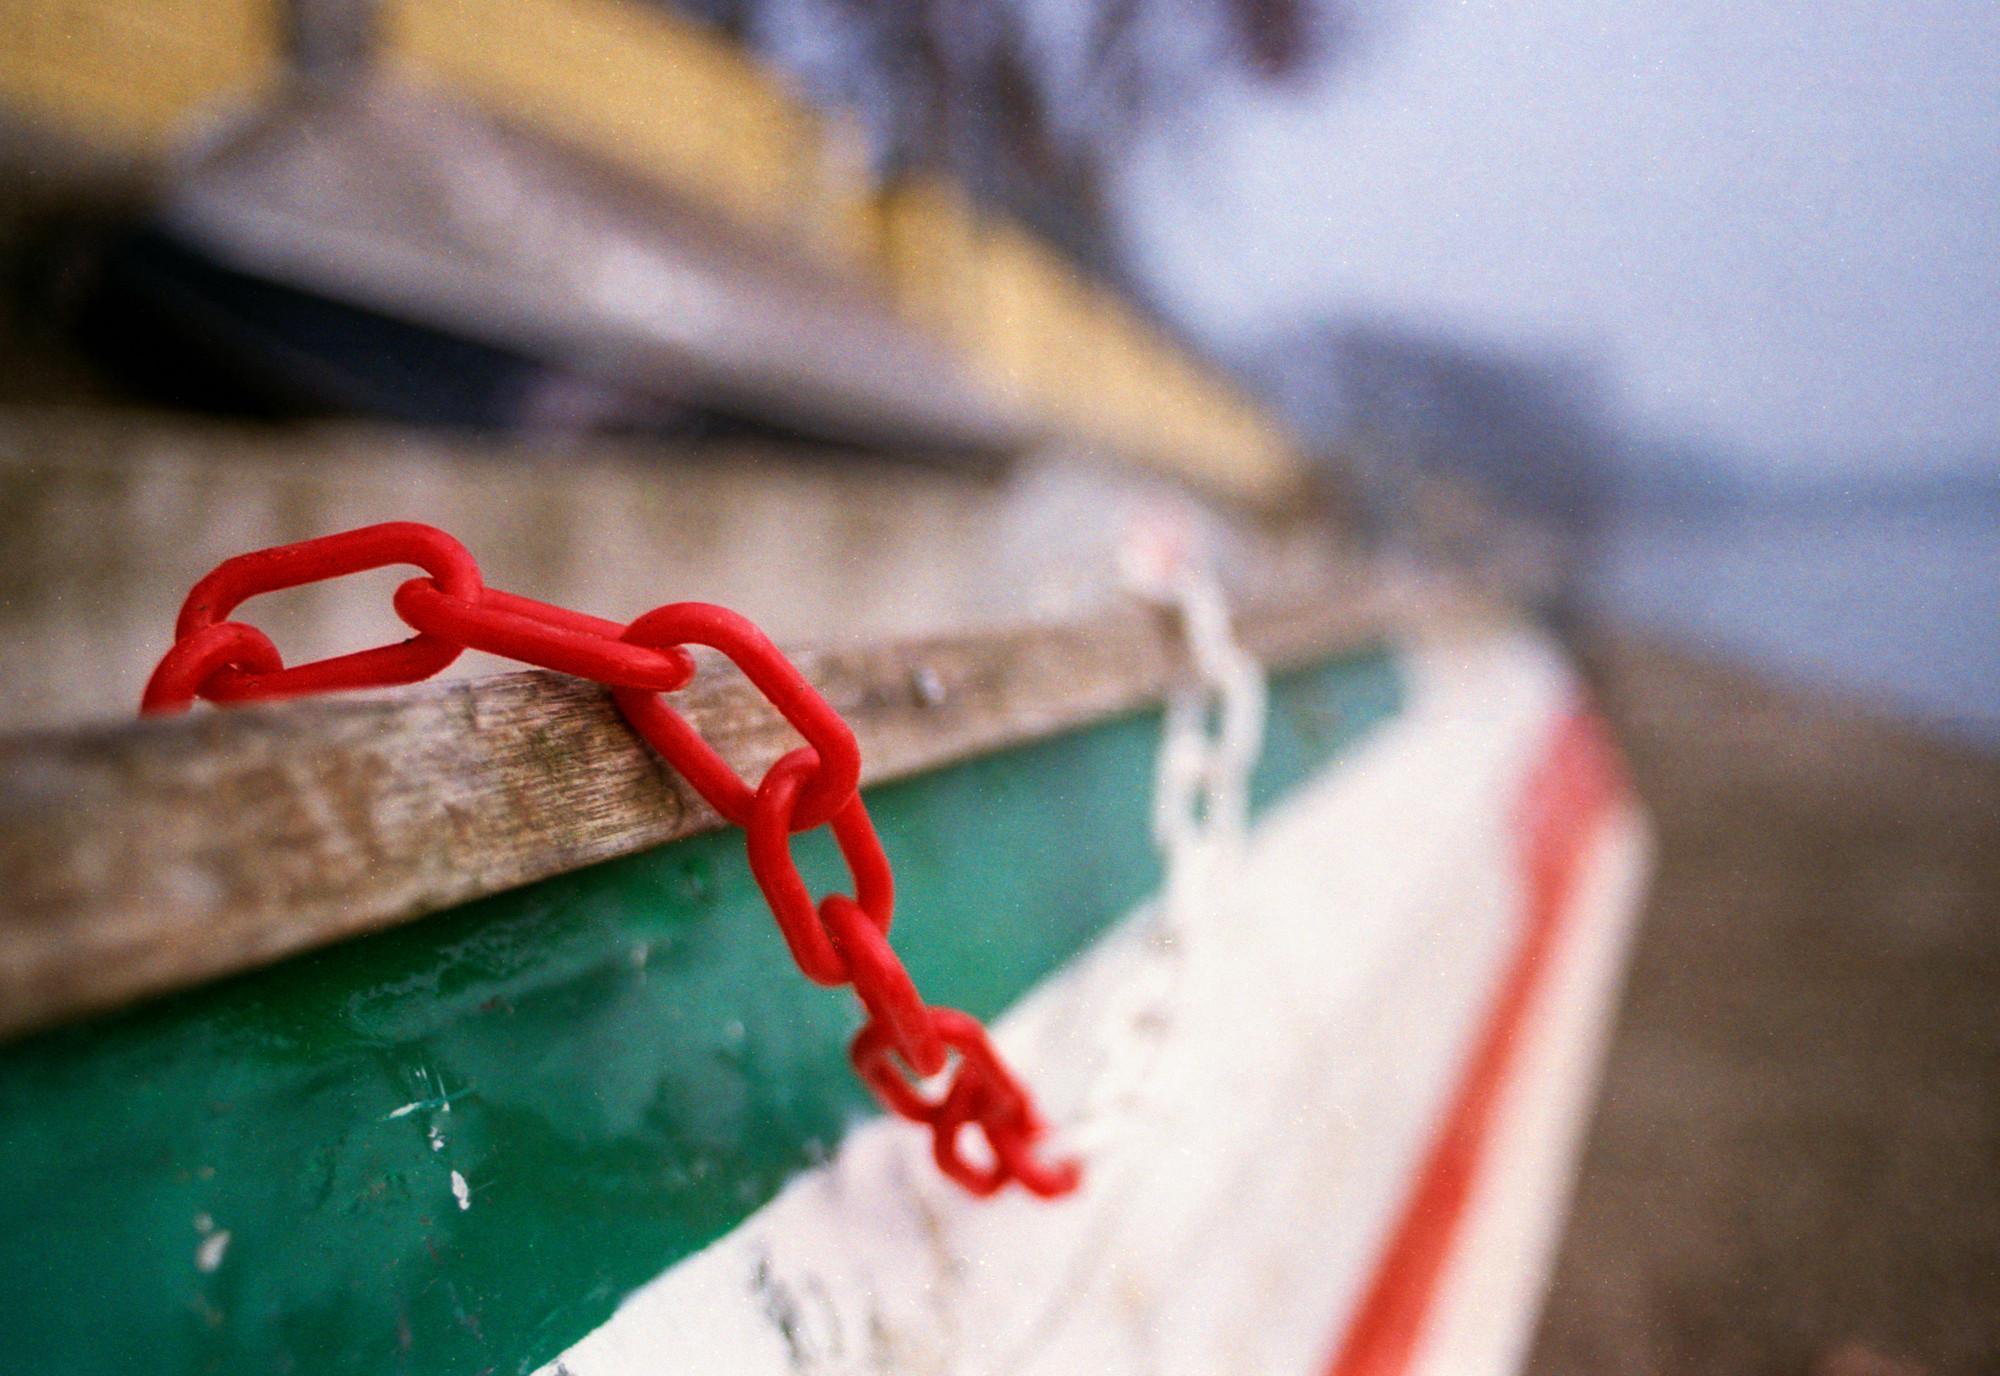 nikon canottieri febbraio 2011_0002 - Copia